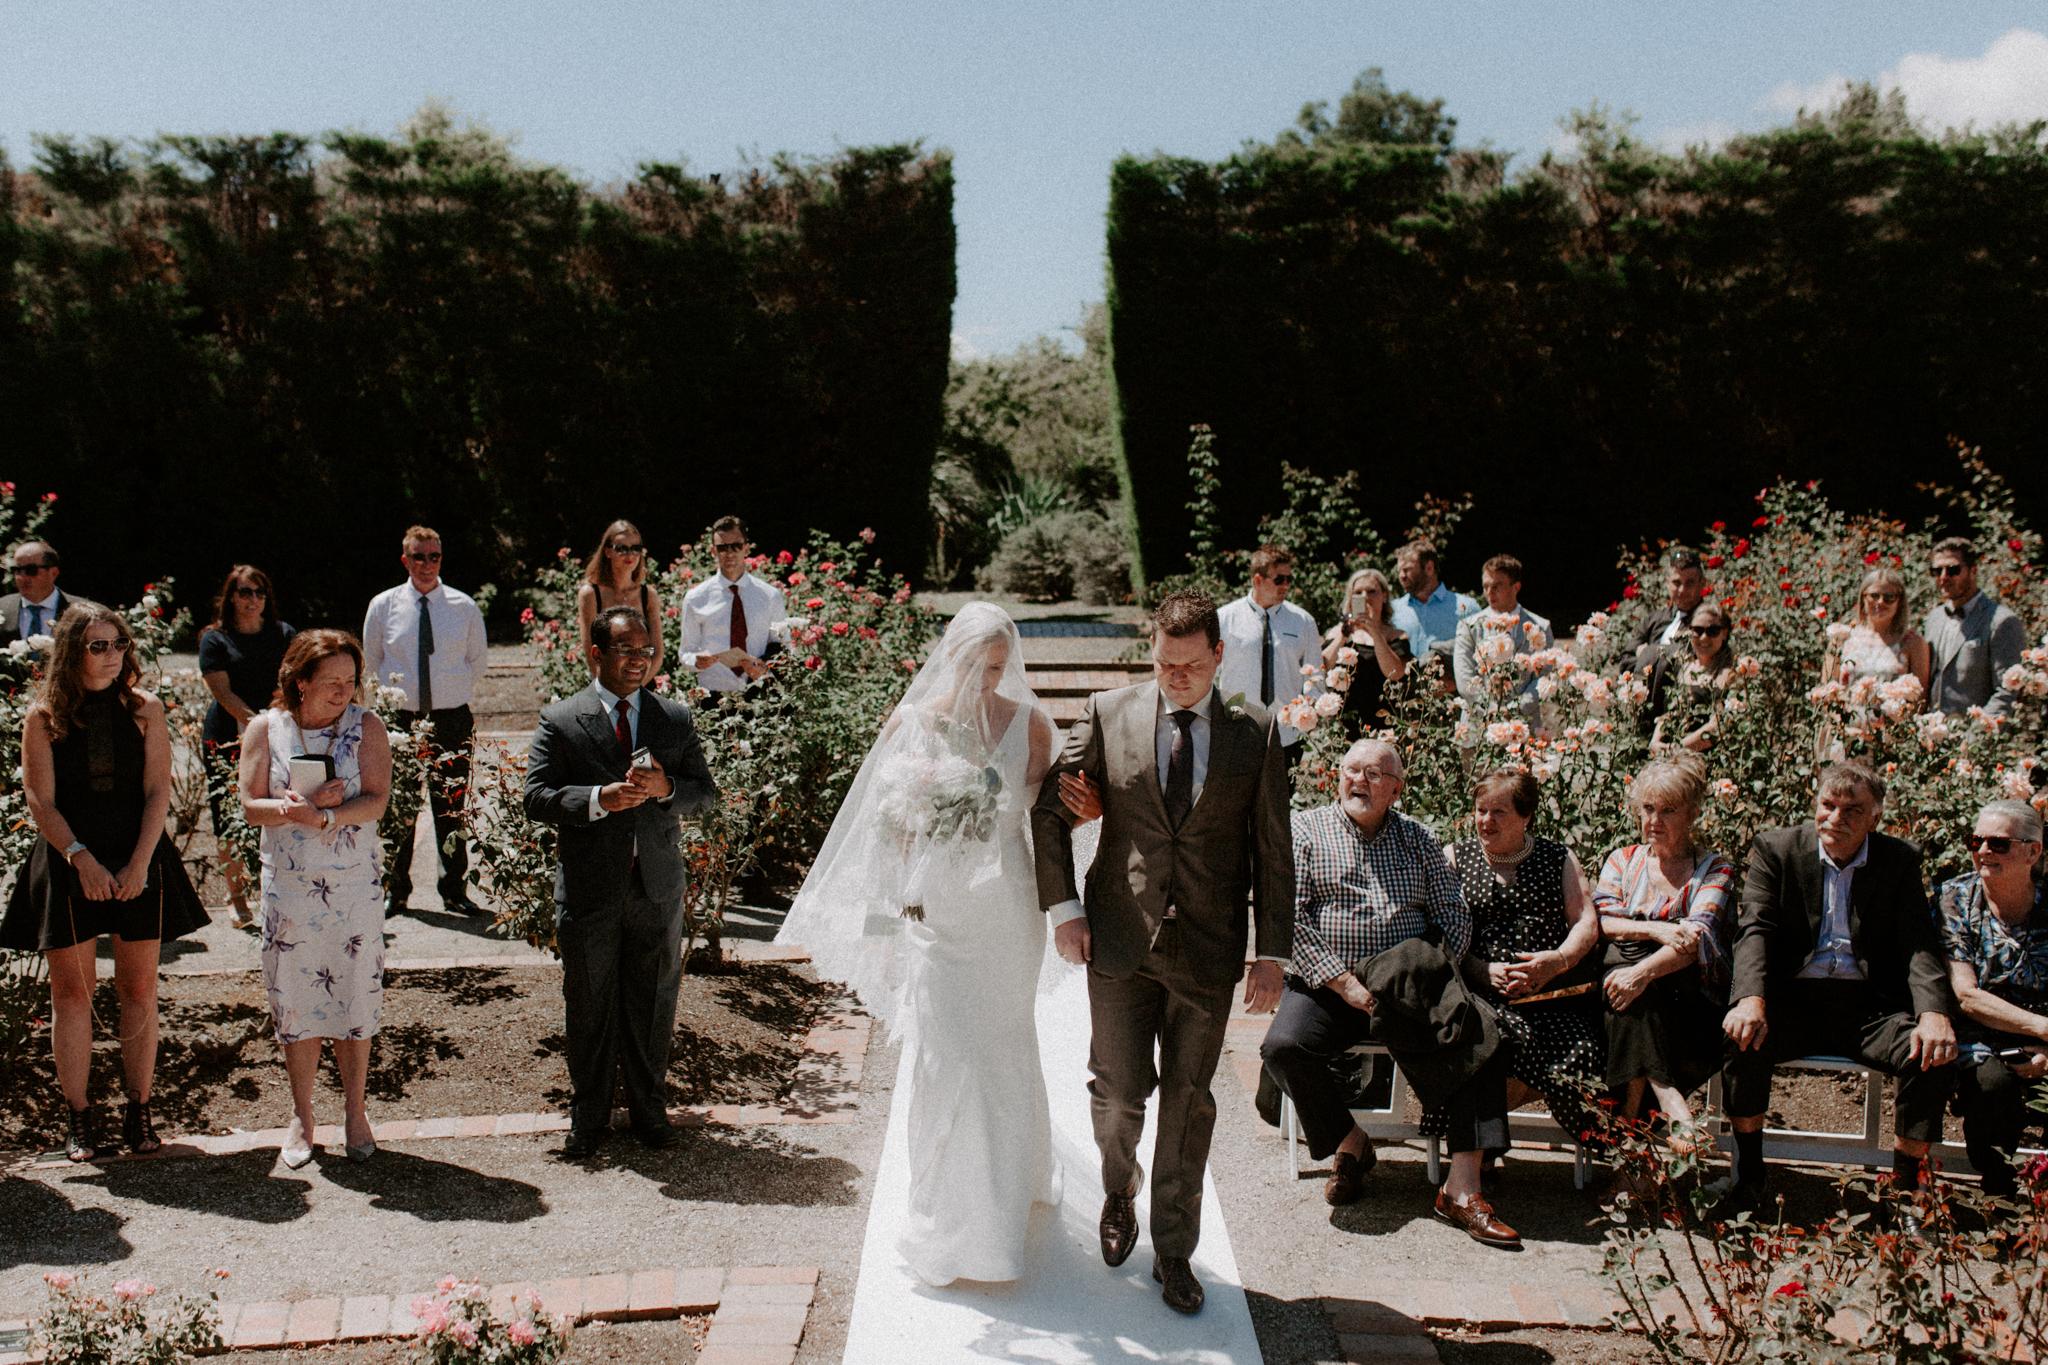 St-Kilda-Garden-Wedding-Emotions-and-Math-Photograph-051.jpg